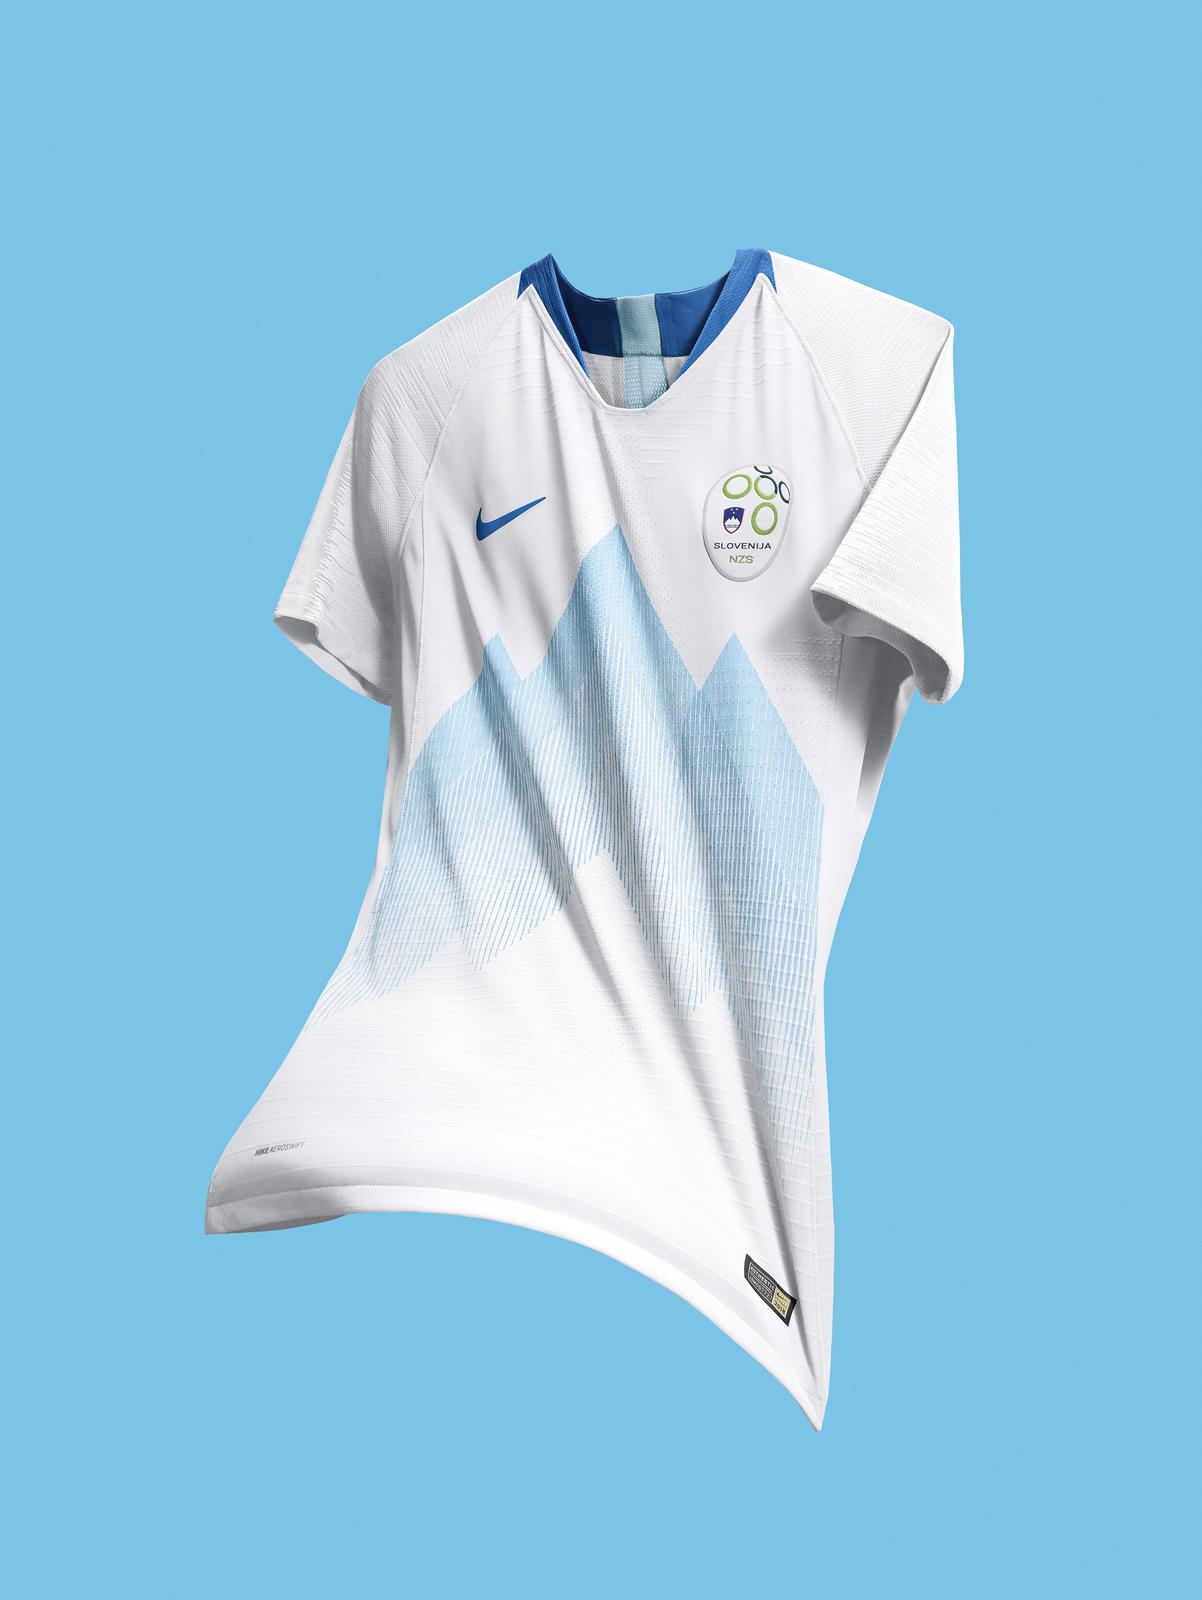 2018 Slovenia National Team Collection - Nike News b4879e010d8